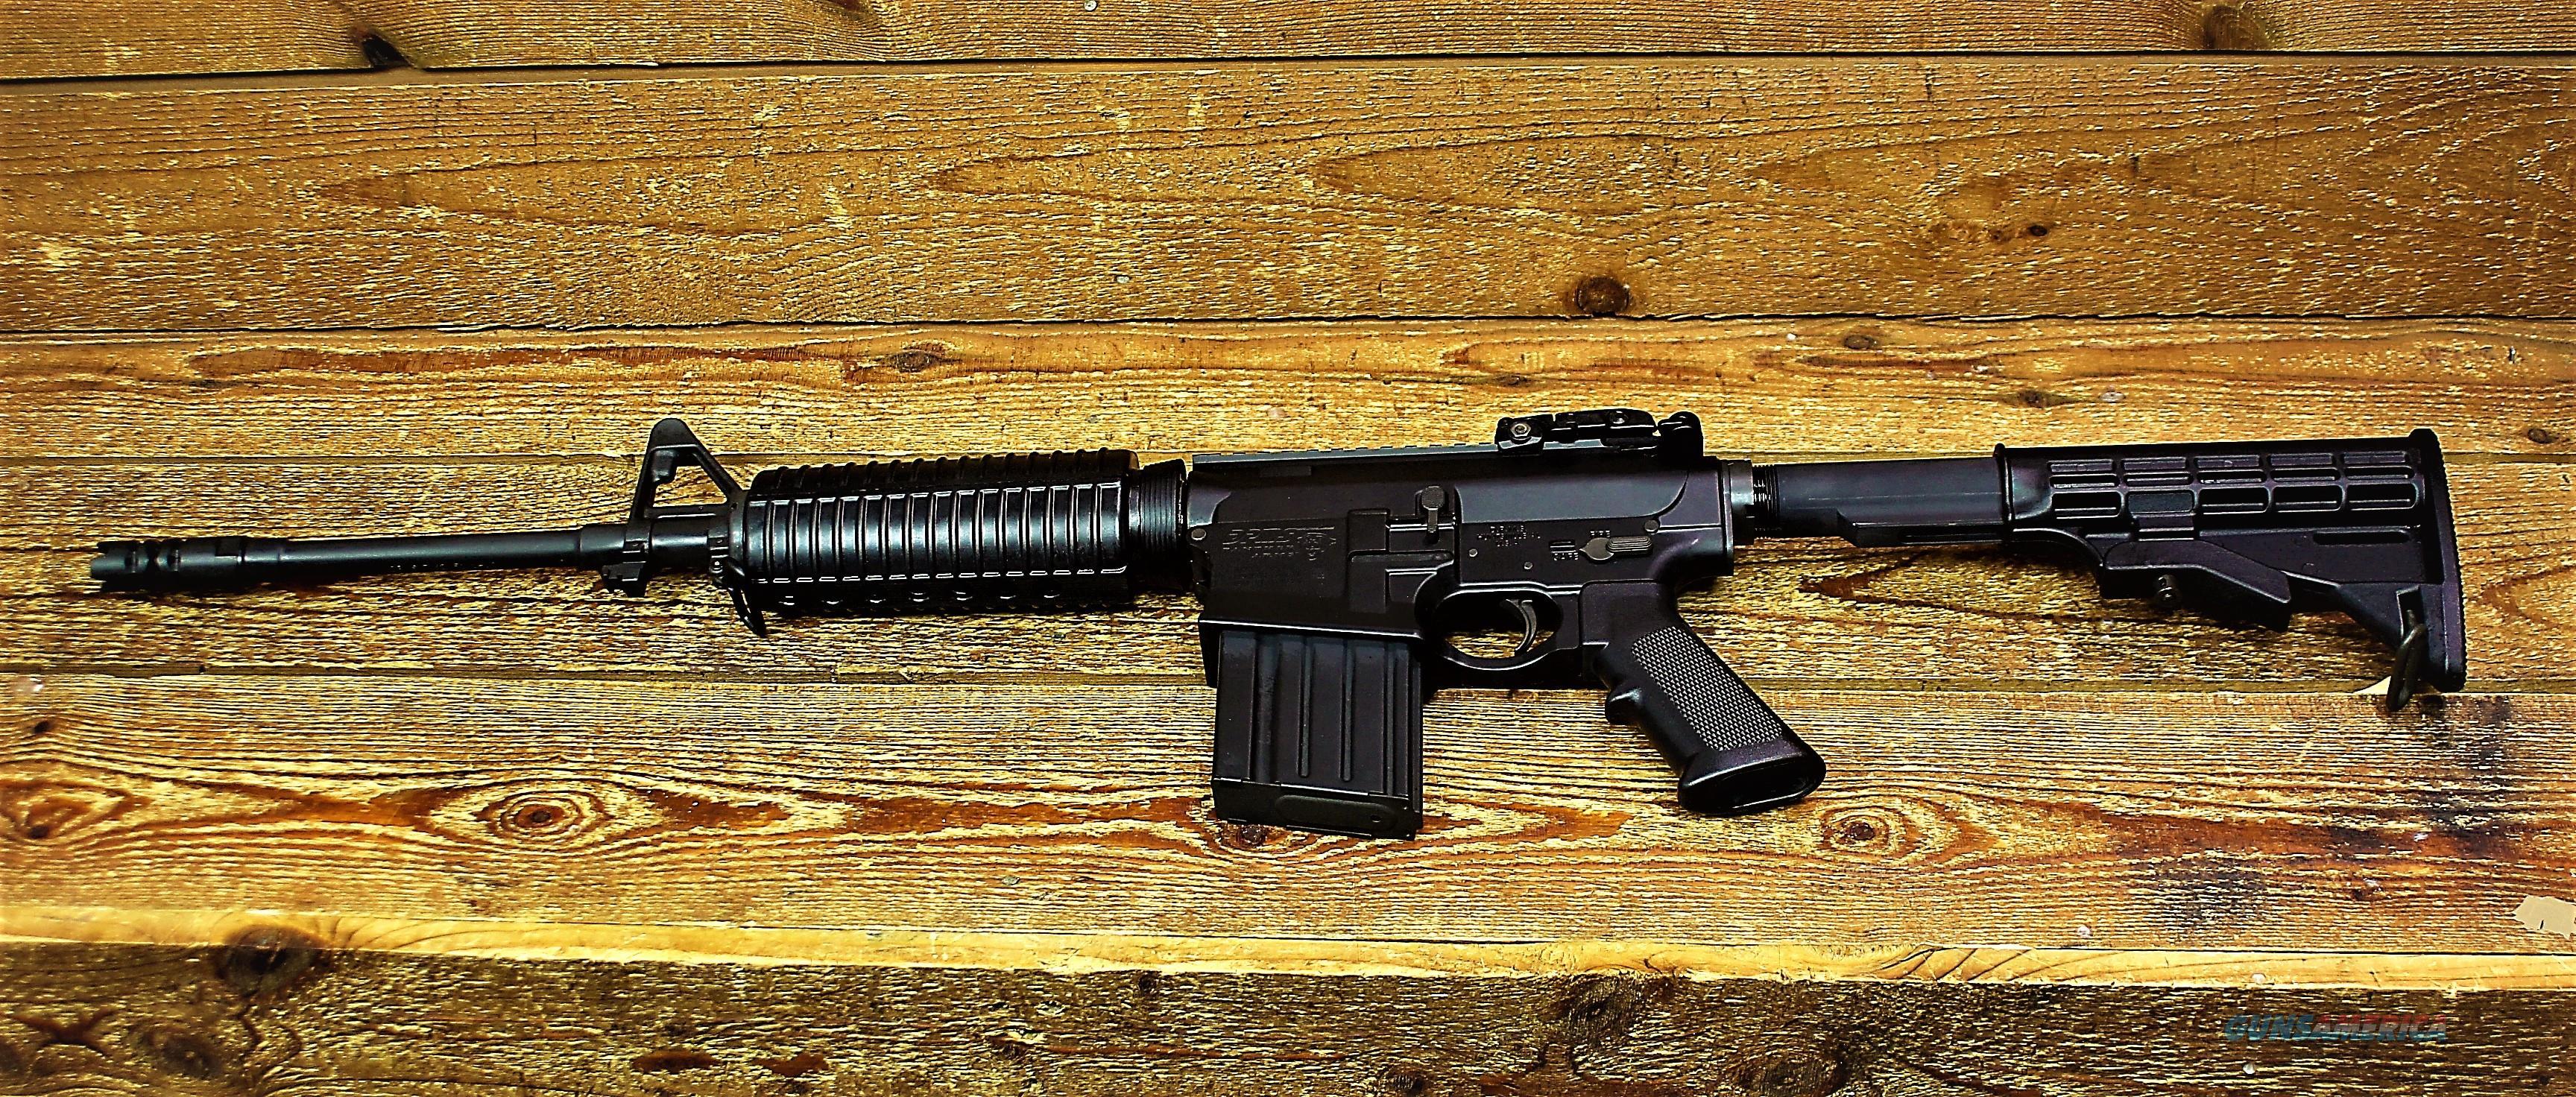 "Sale $95 EASY PAY LAYAWAY DPMS National Rifle Association's Golden Bullseye Award Winner Panther Arms GII AP4   .308 Win 7.62 NATO 16"" Lightweight Barrel 20 Rds M4 Collapsible Stock A2 Pistol Grip Black AR-10 AR10 hunters RFLR-G2AP4  60220  Guns > Rifles > DPMS - Panther Arms > Complete Rifle"